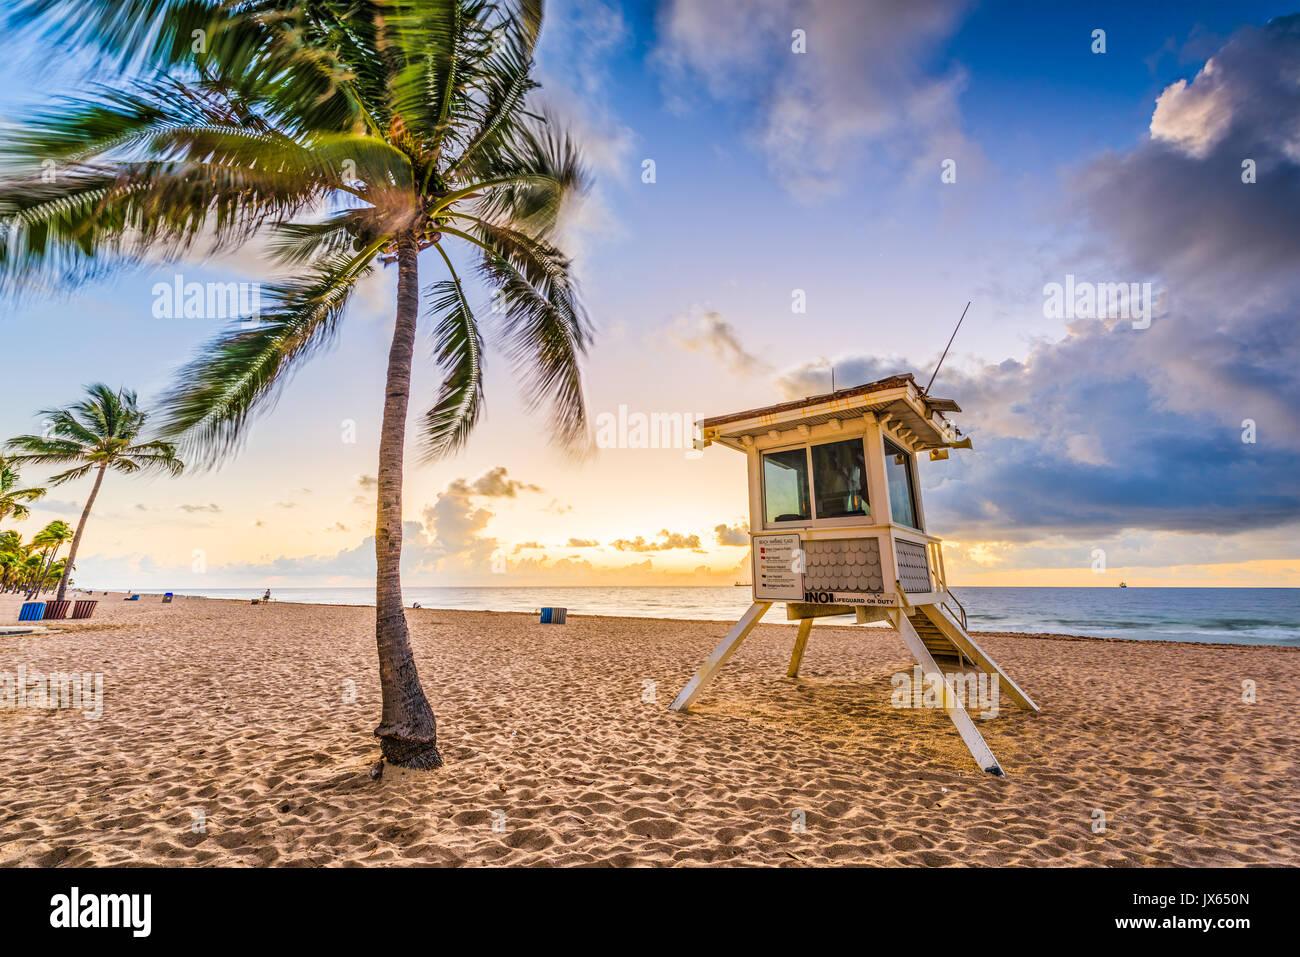 Fort Lauderdale Beach, Florida, USA. - Stock Image